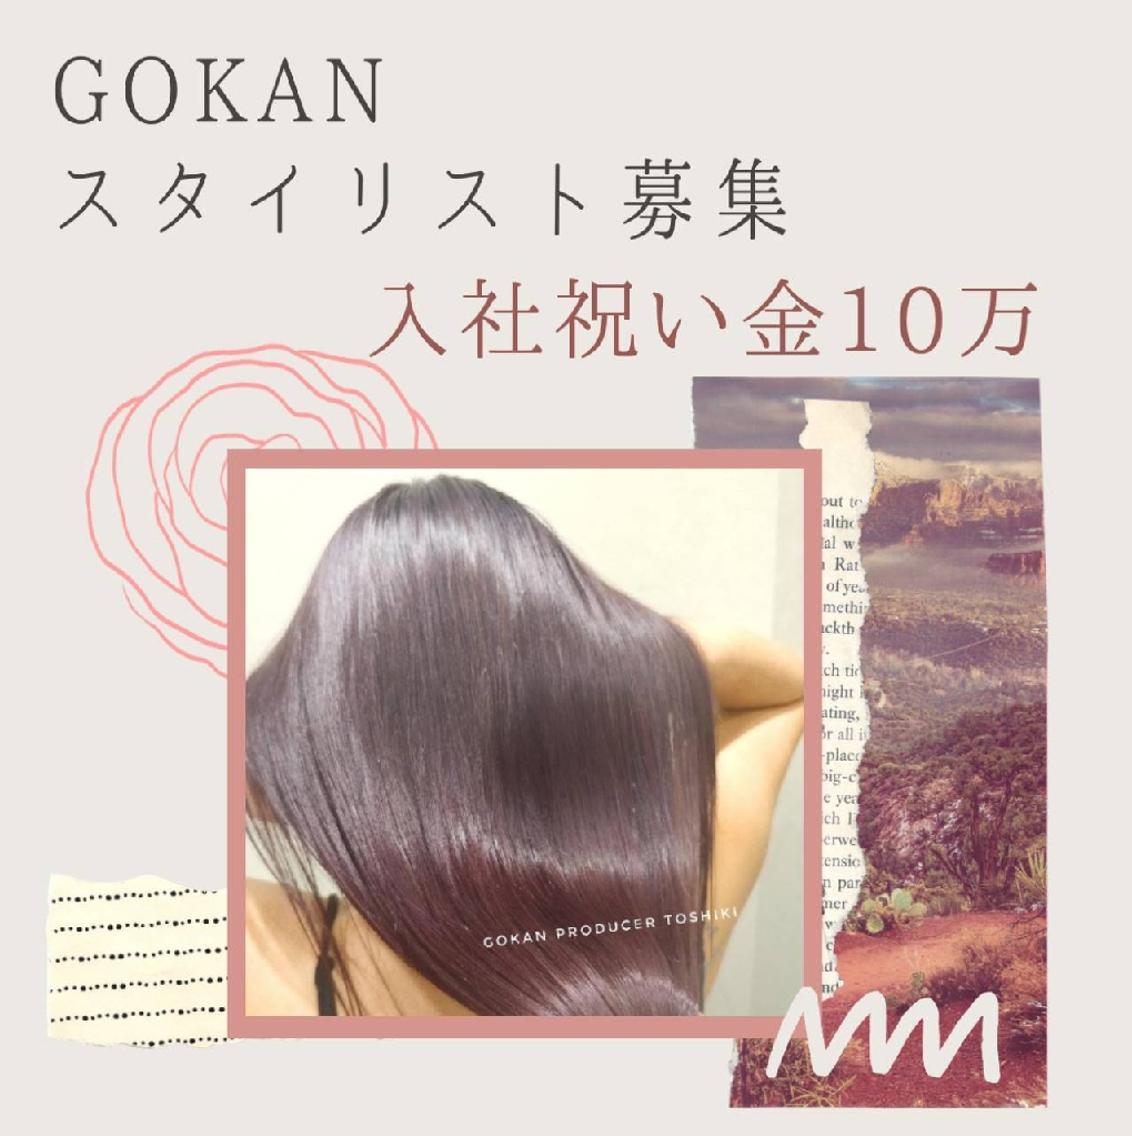 gokan所属・ナカシマトシキの掲載